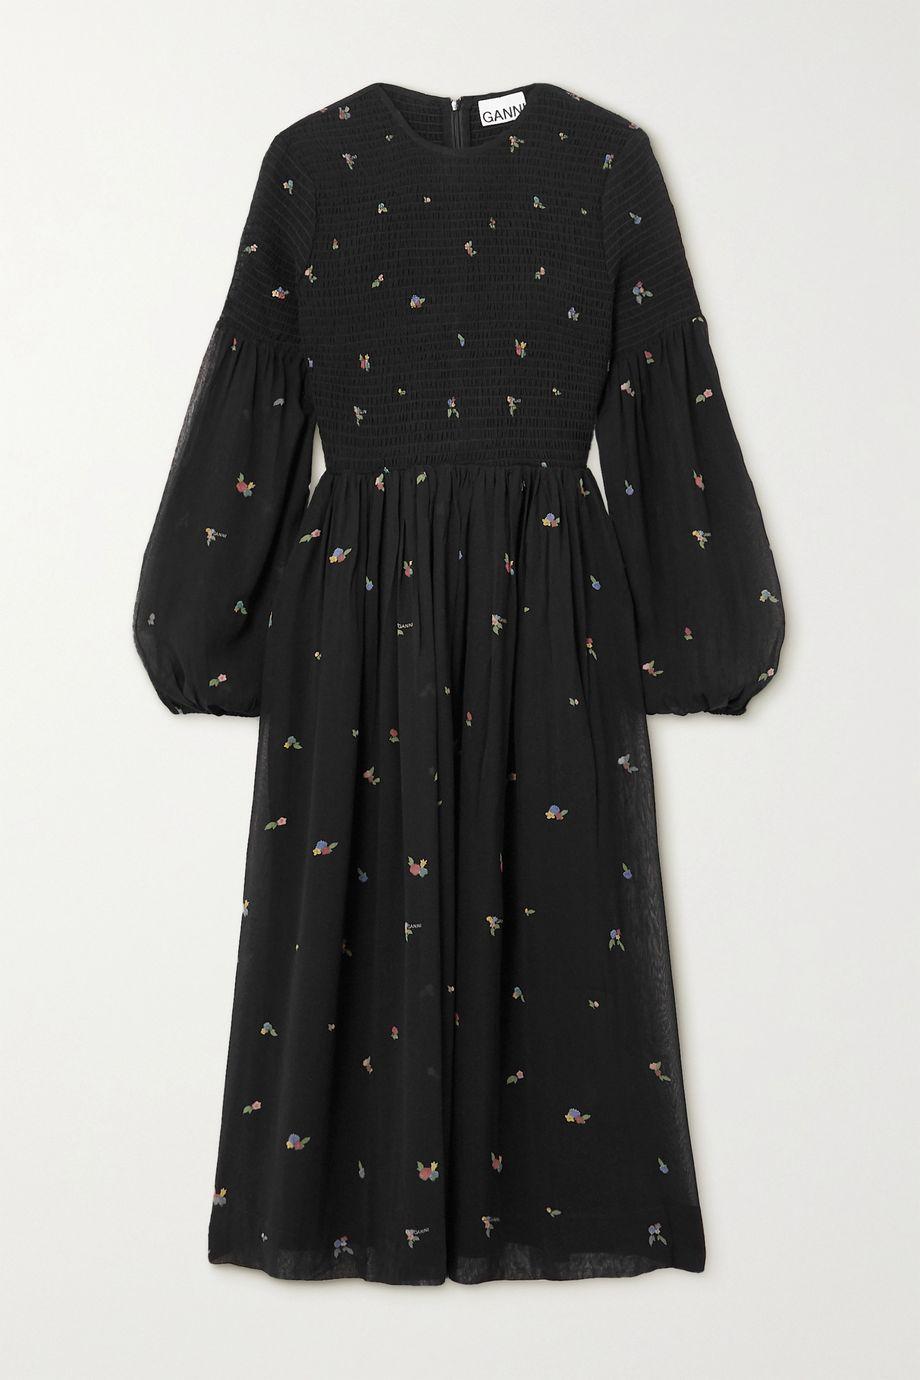 GANNI Smocked printed georgette midi dress